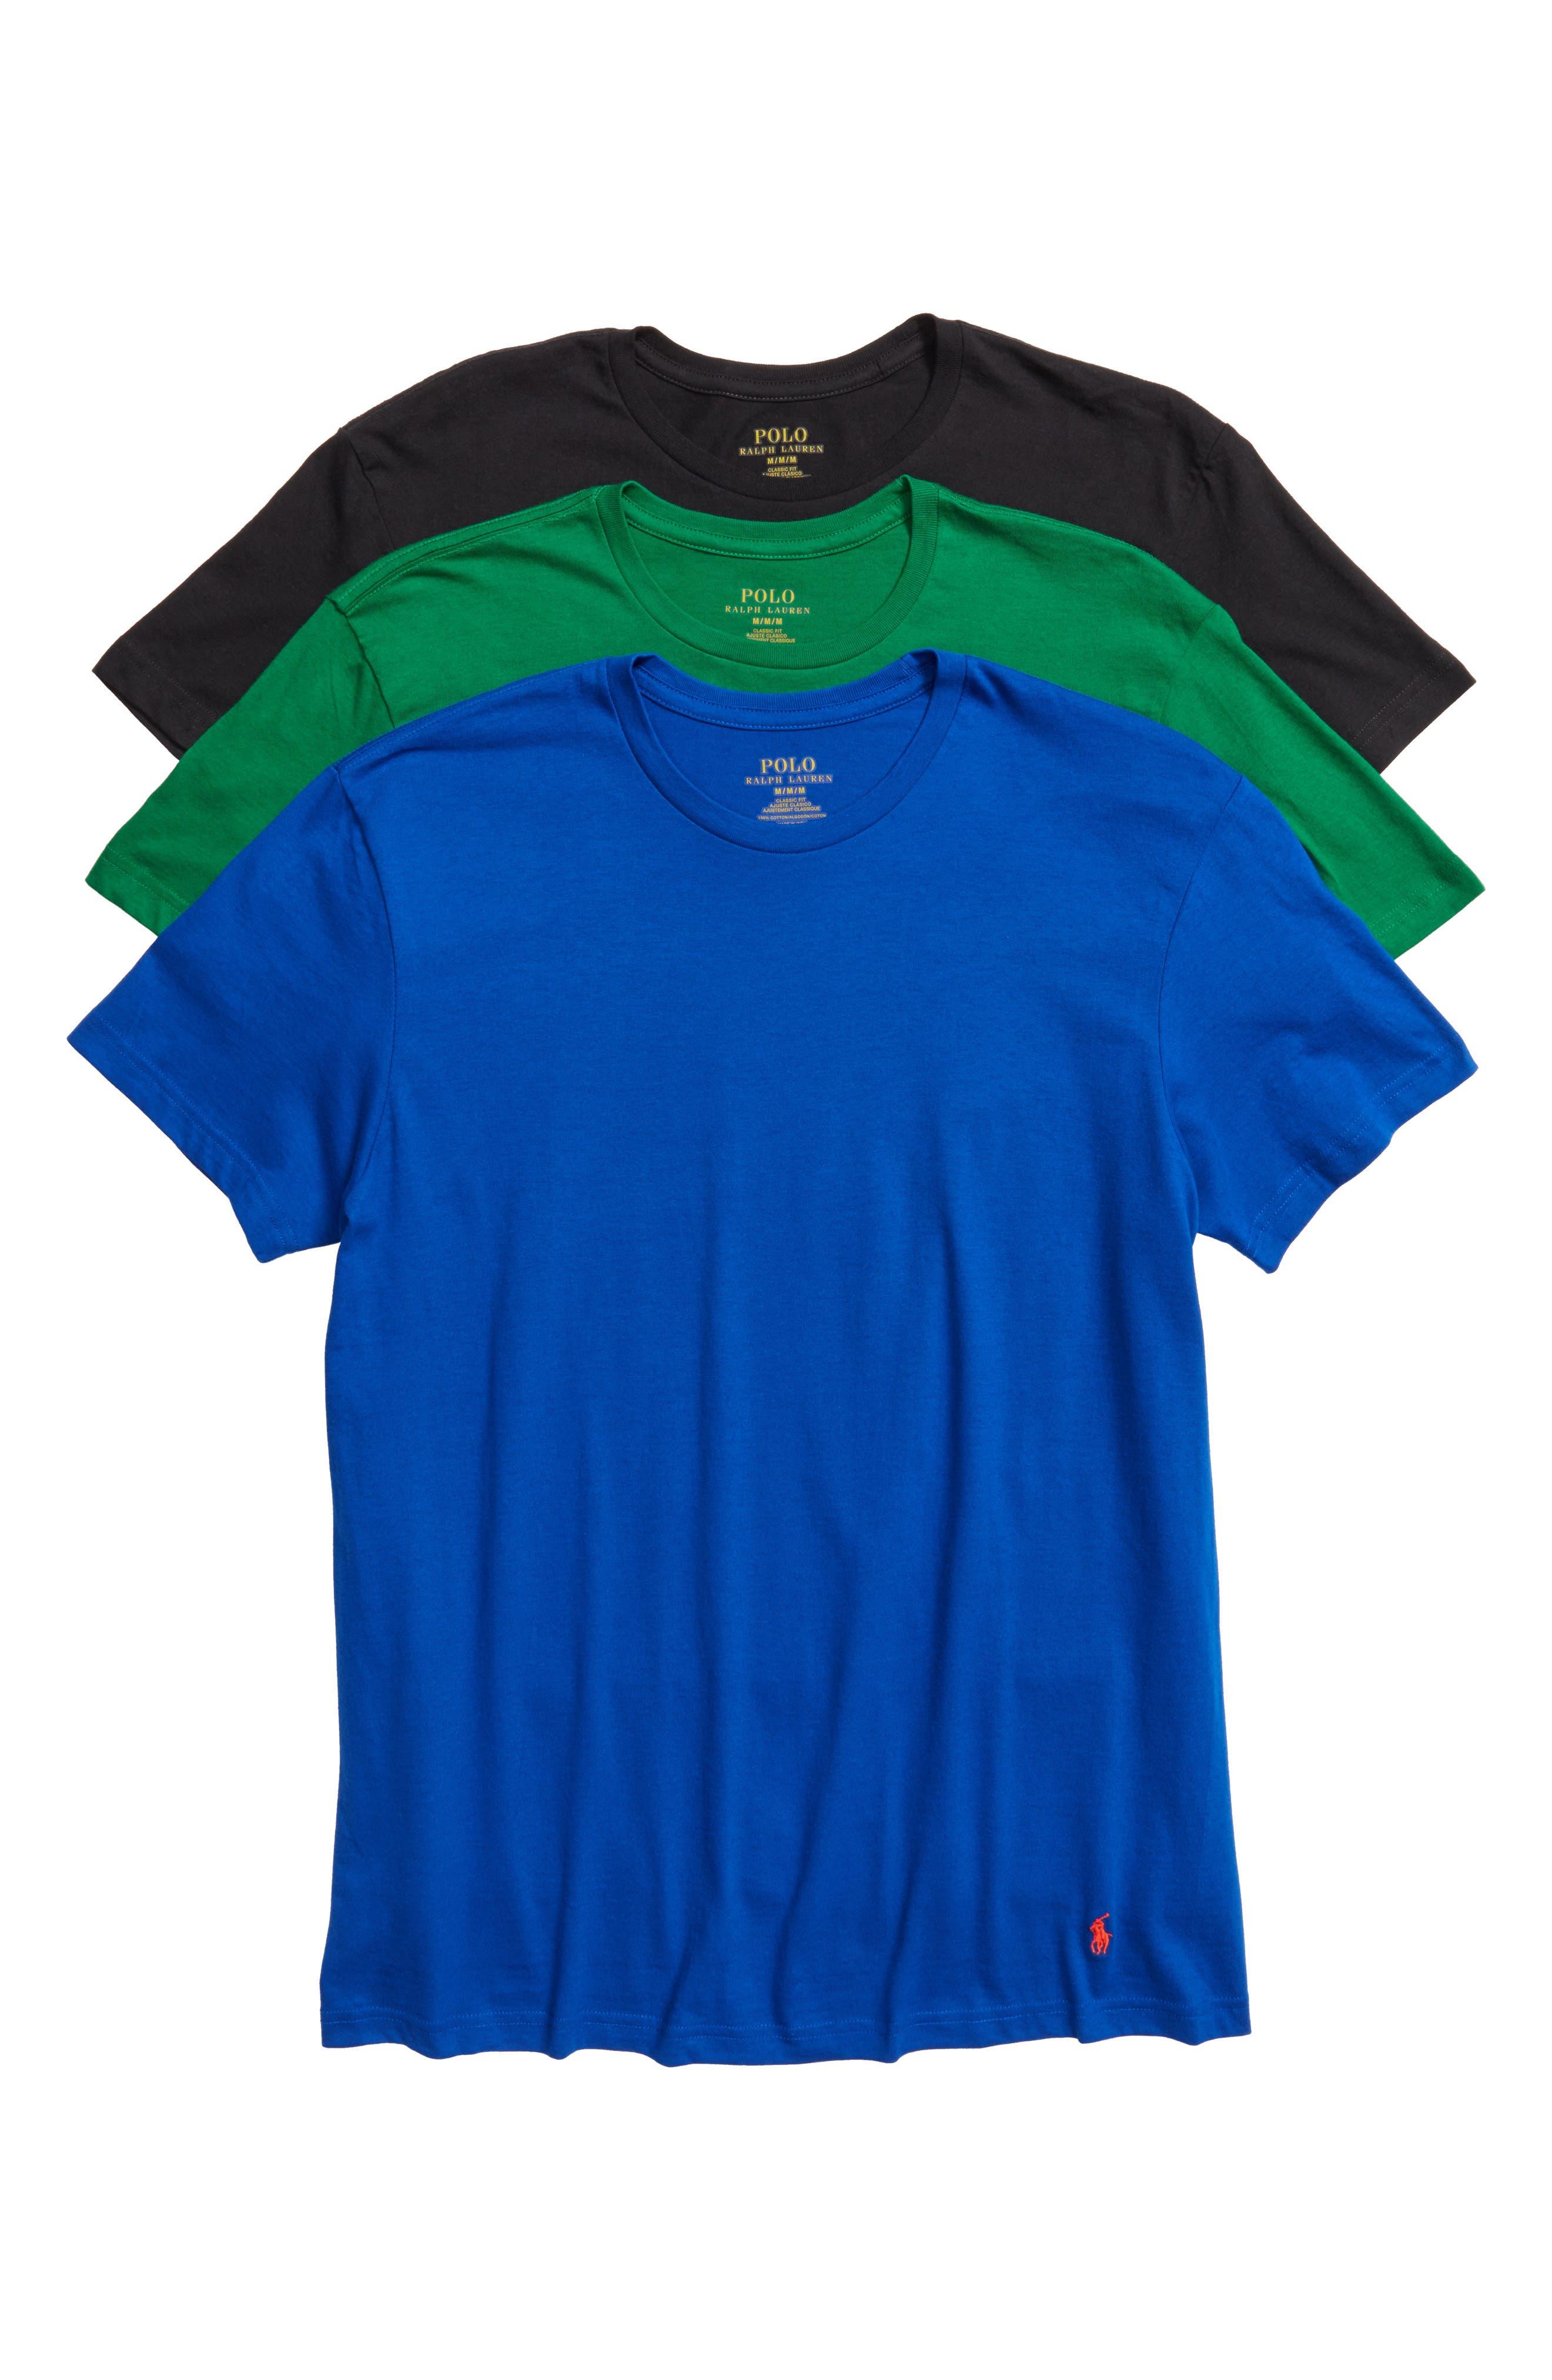 Alternate Image 1 Selected - Polo Ralph Lauren 3-Pack Crewneck Cotton T-Shirts